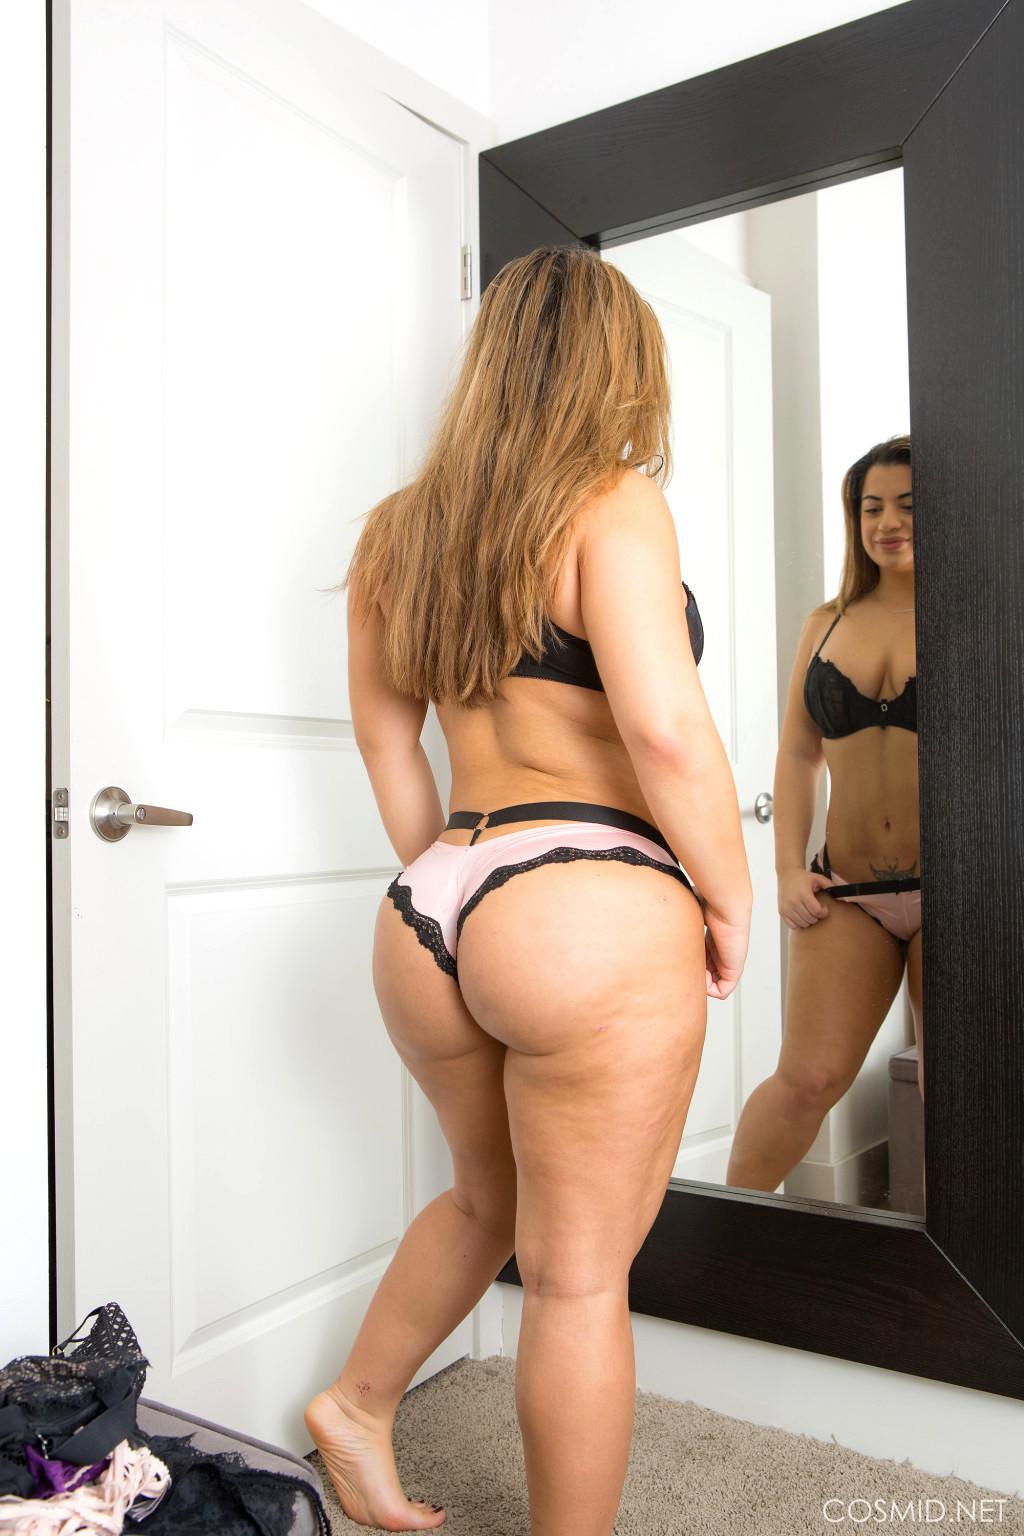 Babe Today Cosmid Lisa Martiz Crazy Busty Post Porn Pics-2965